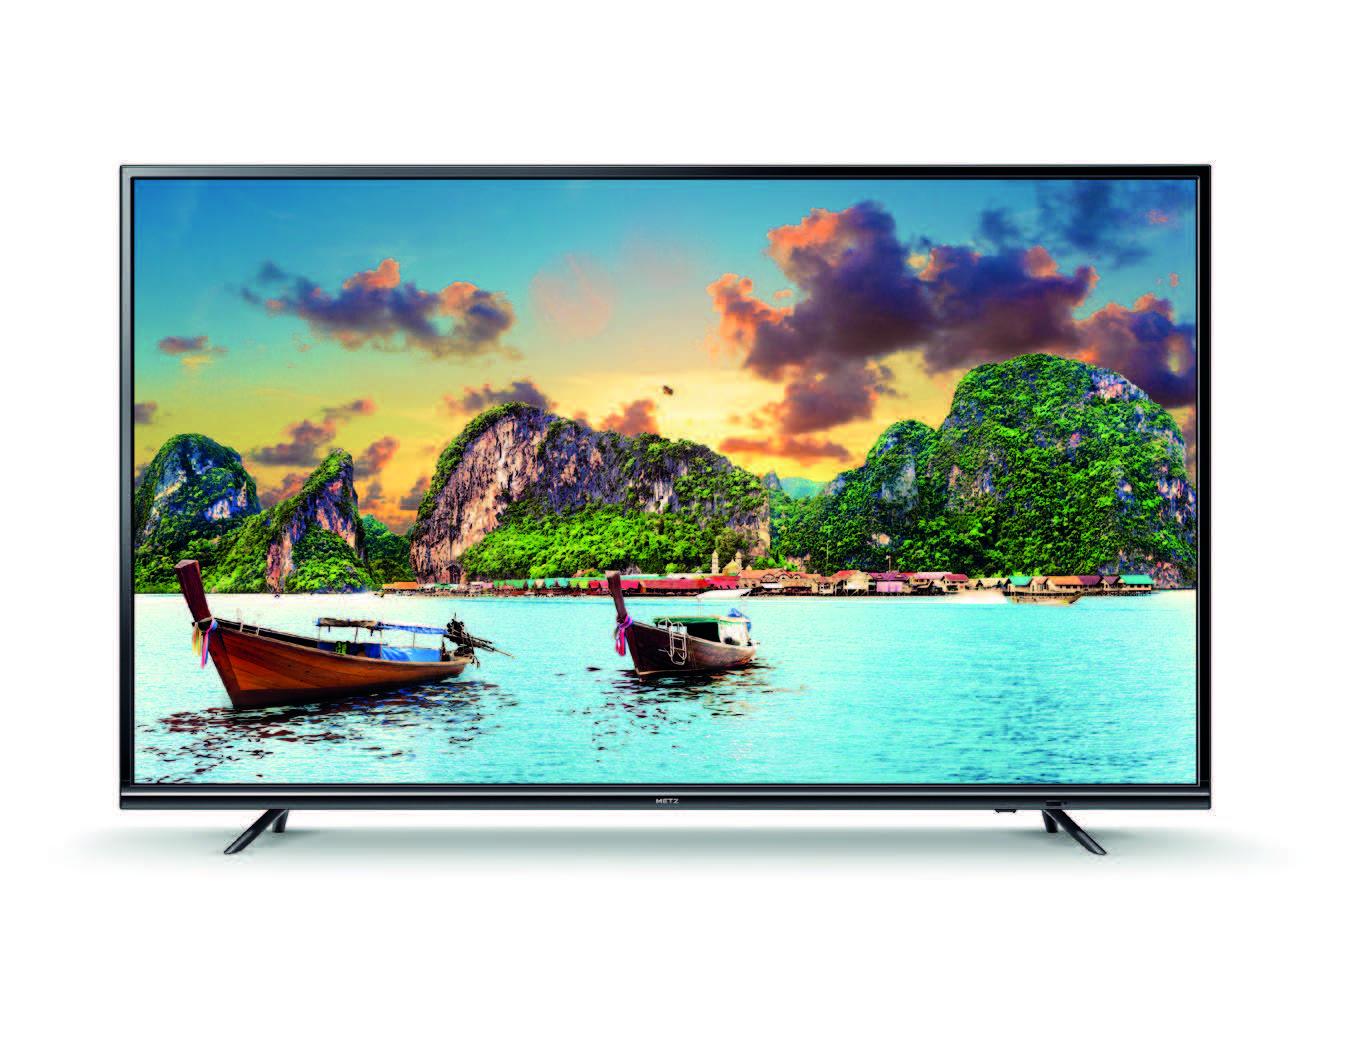 METZ TV LED 50UHD 4K SMART TV DVB-T2/S2